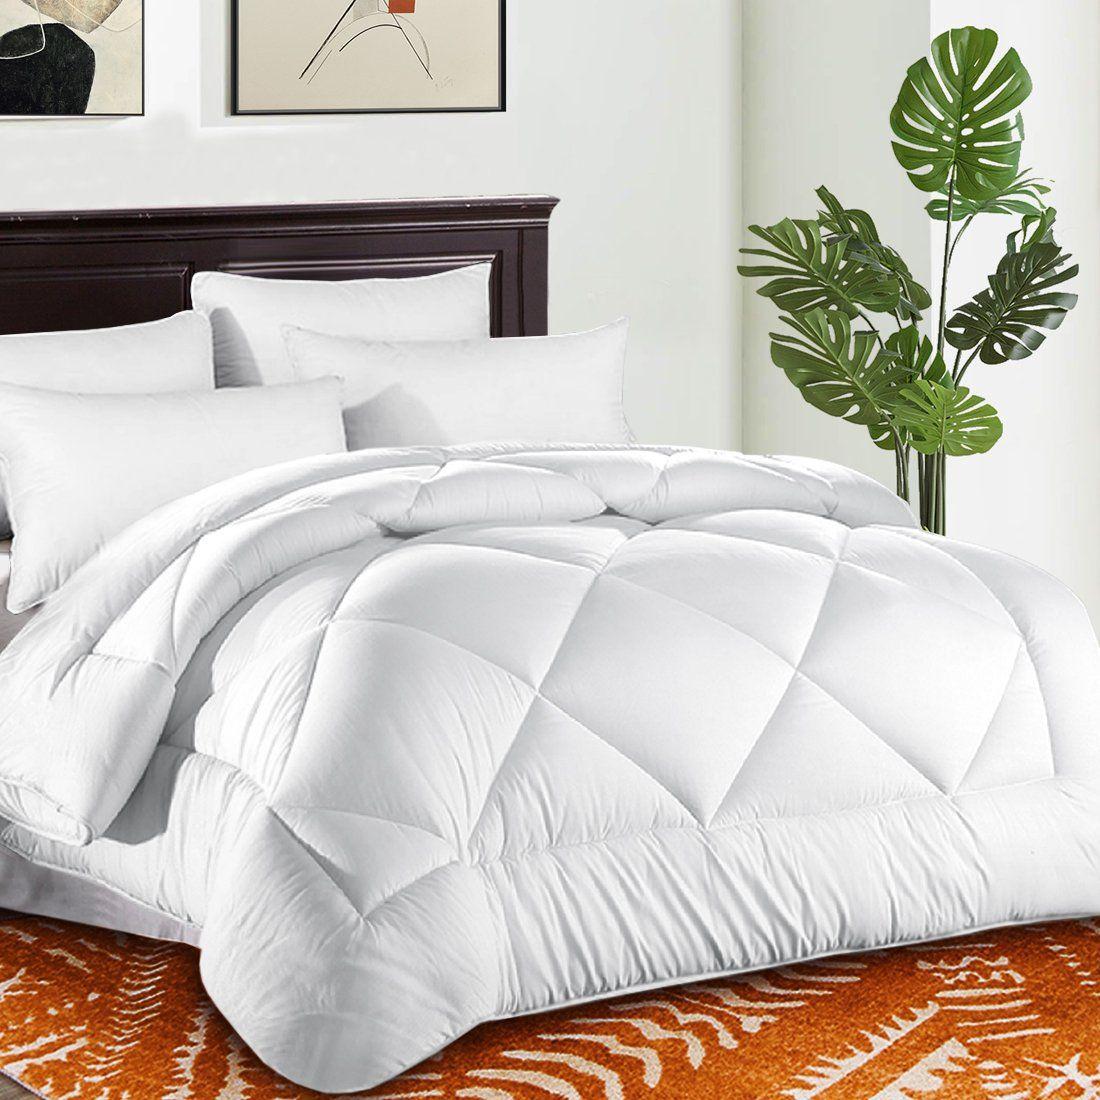 Queen Comforter Soft Quilted ♥ Down Alternative Duvet